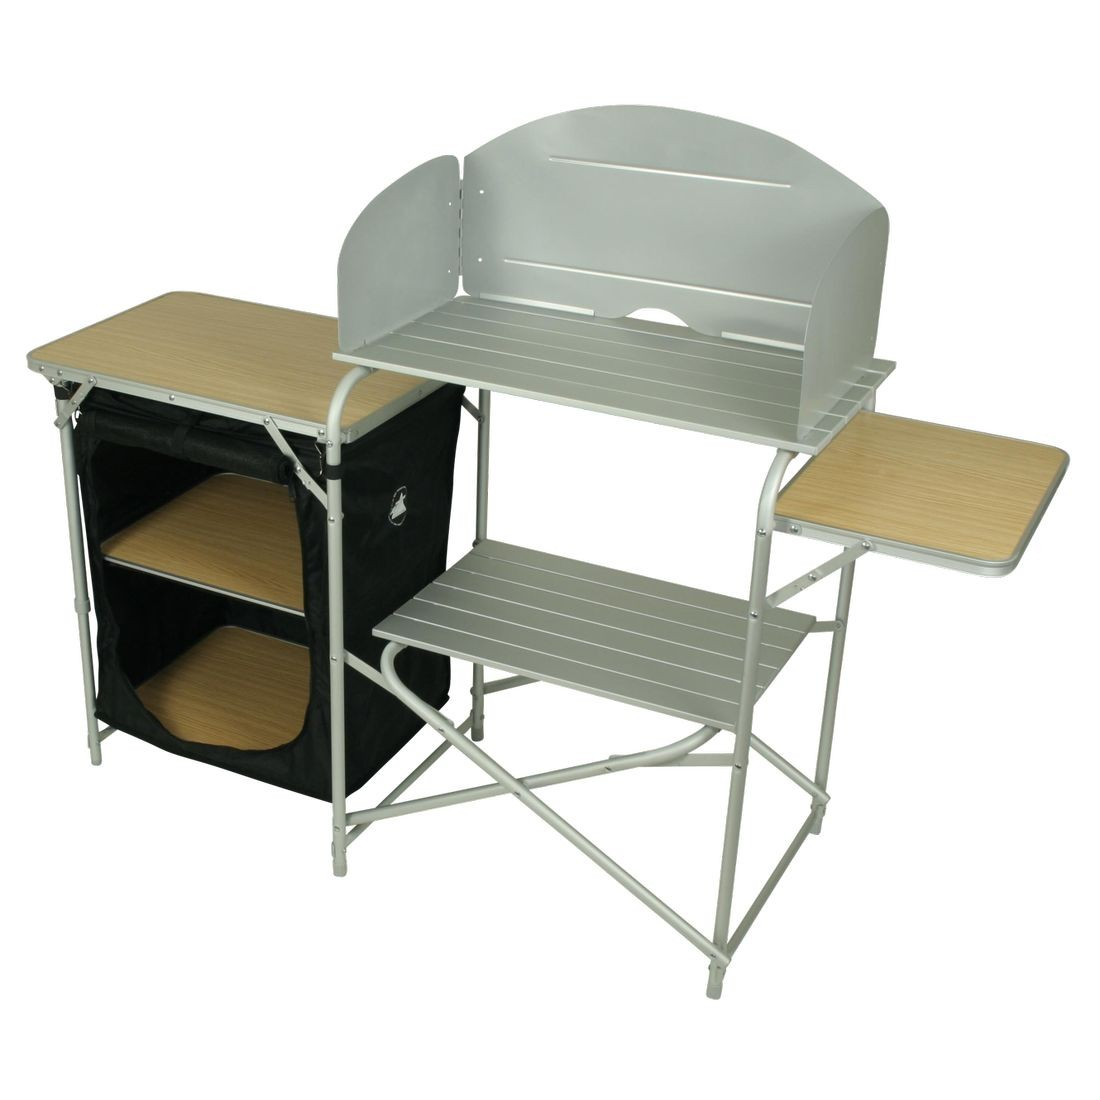 Comprare Cucine da campeggio da a Camping Outdoor online.